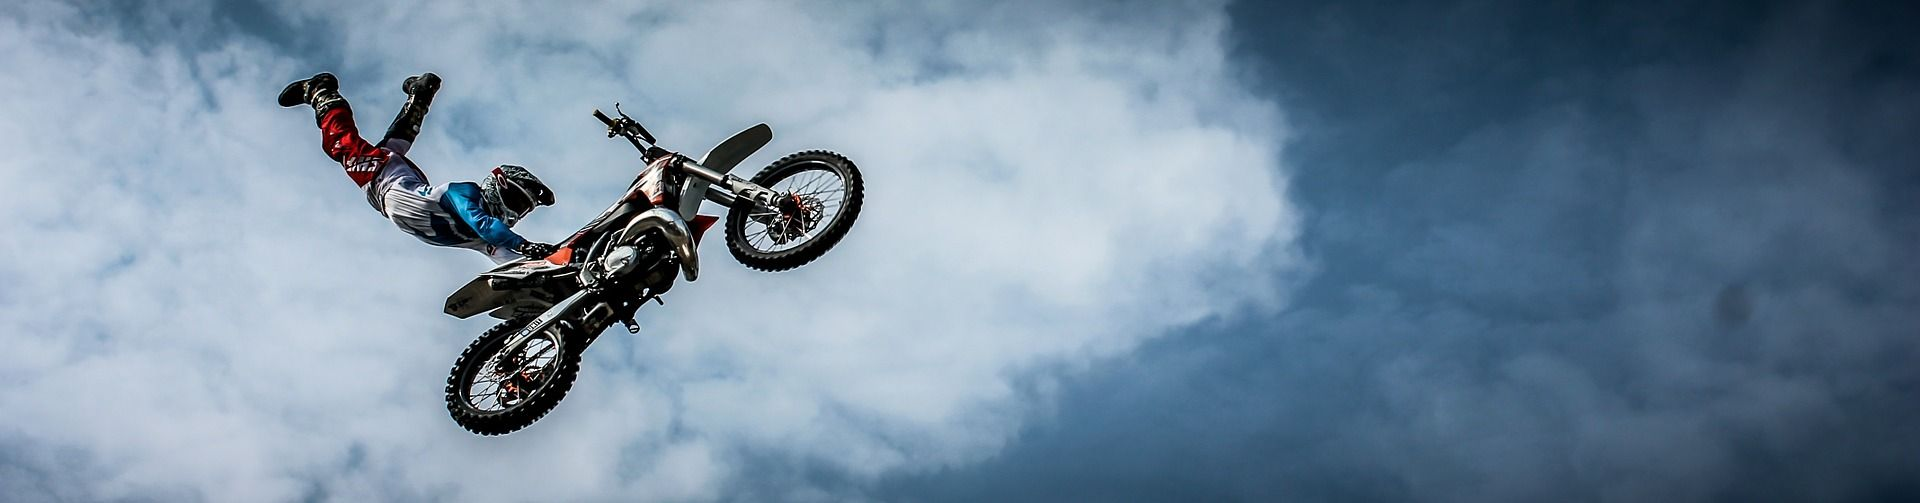 biker, motorcycle, acrobat Adventure, Free stock photos